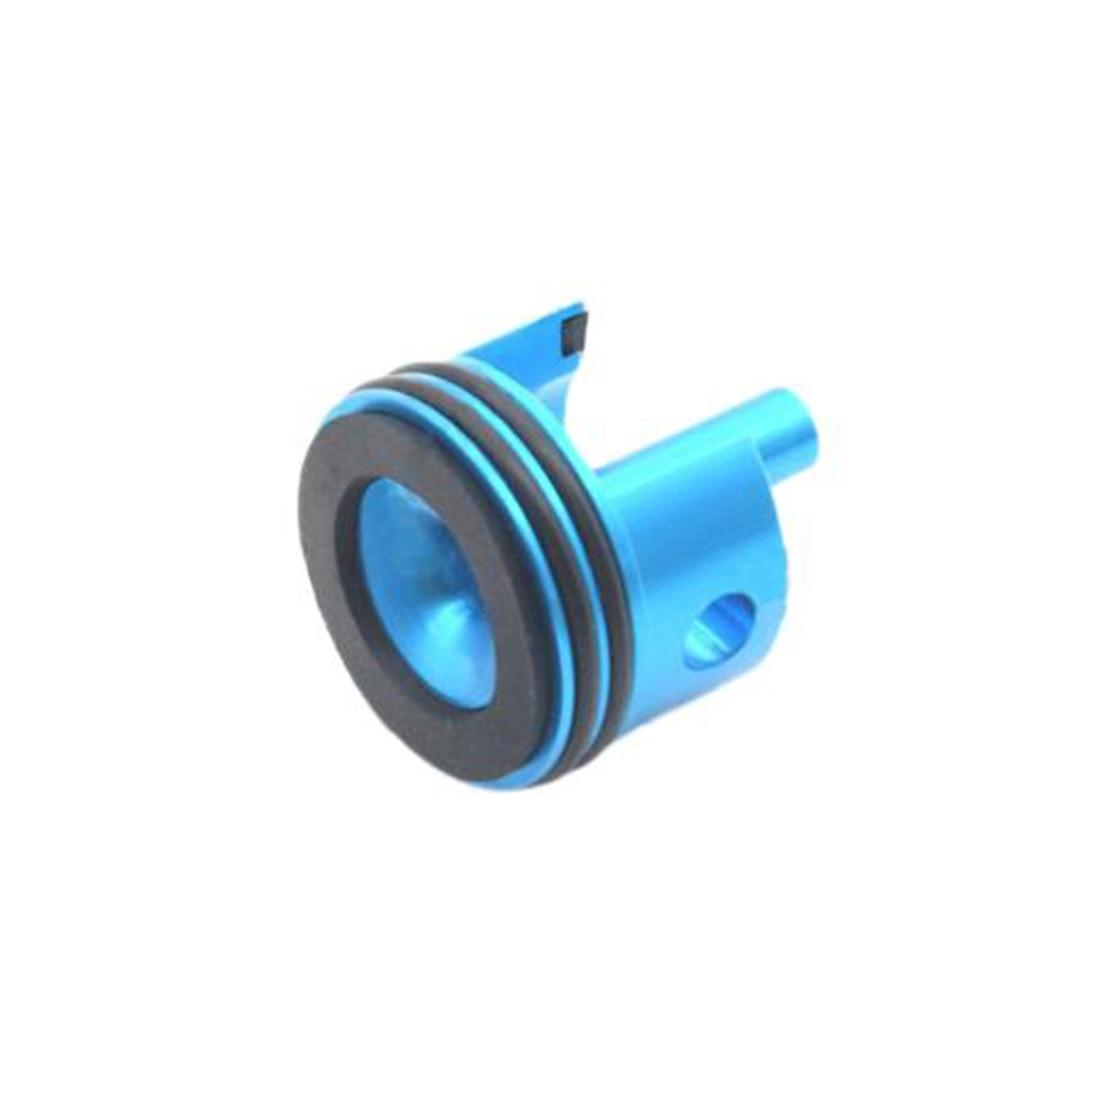 Original For NMB 2410RL-04W-S29 12V 0.1A 6025 6CM 60mm low noise silence silent fan